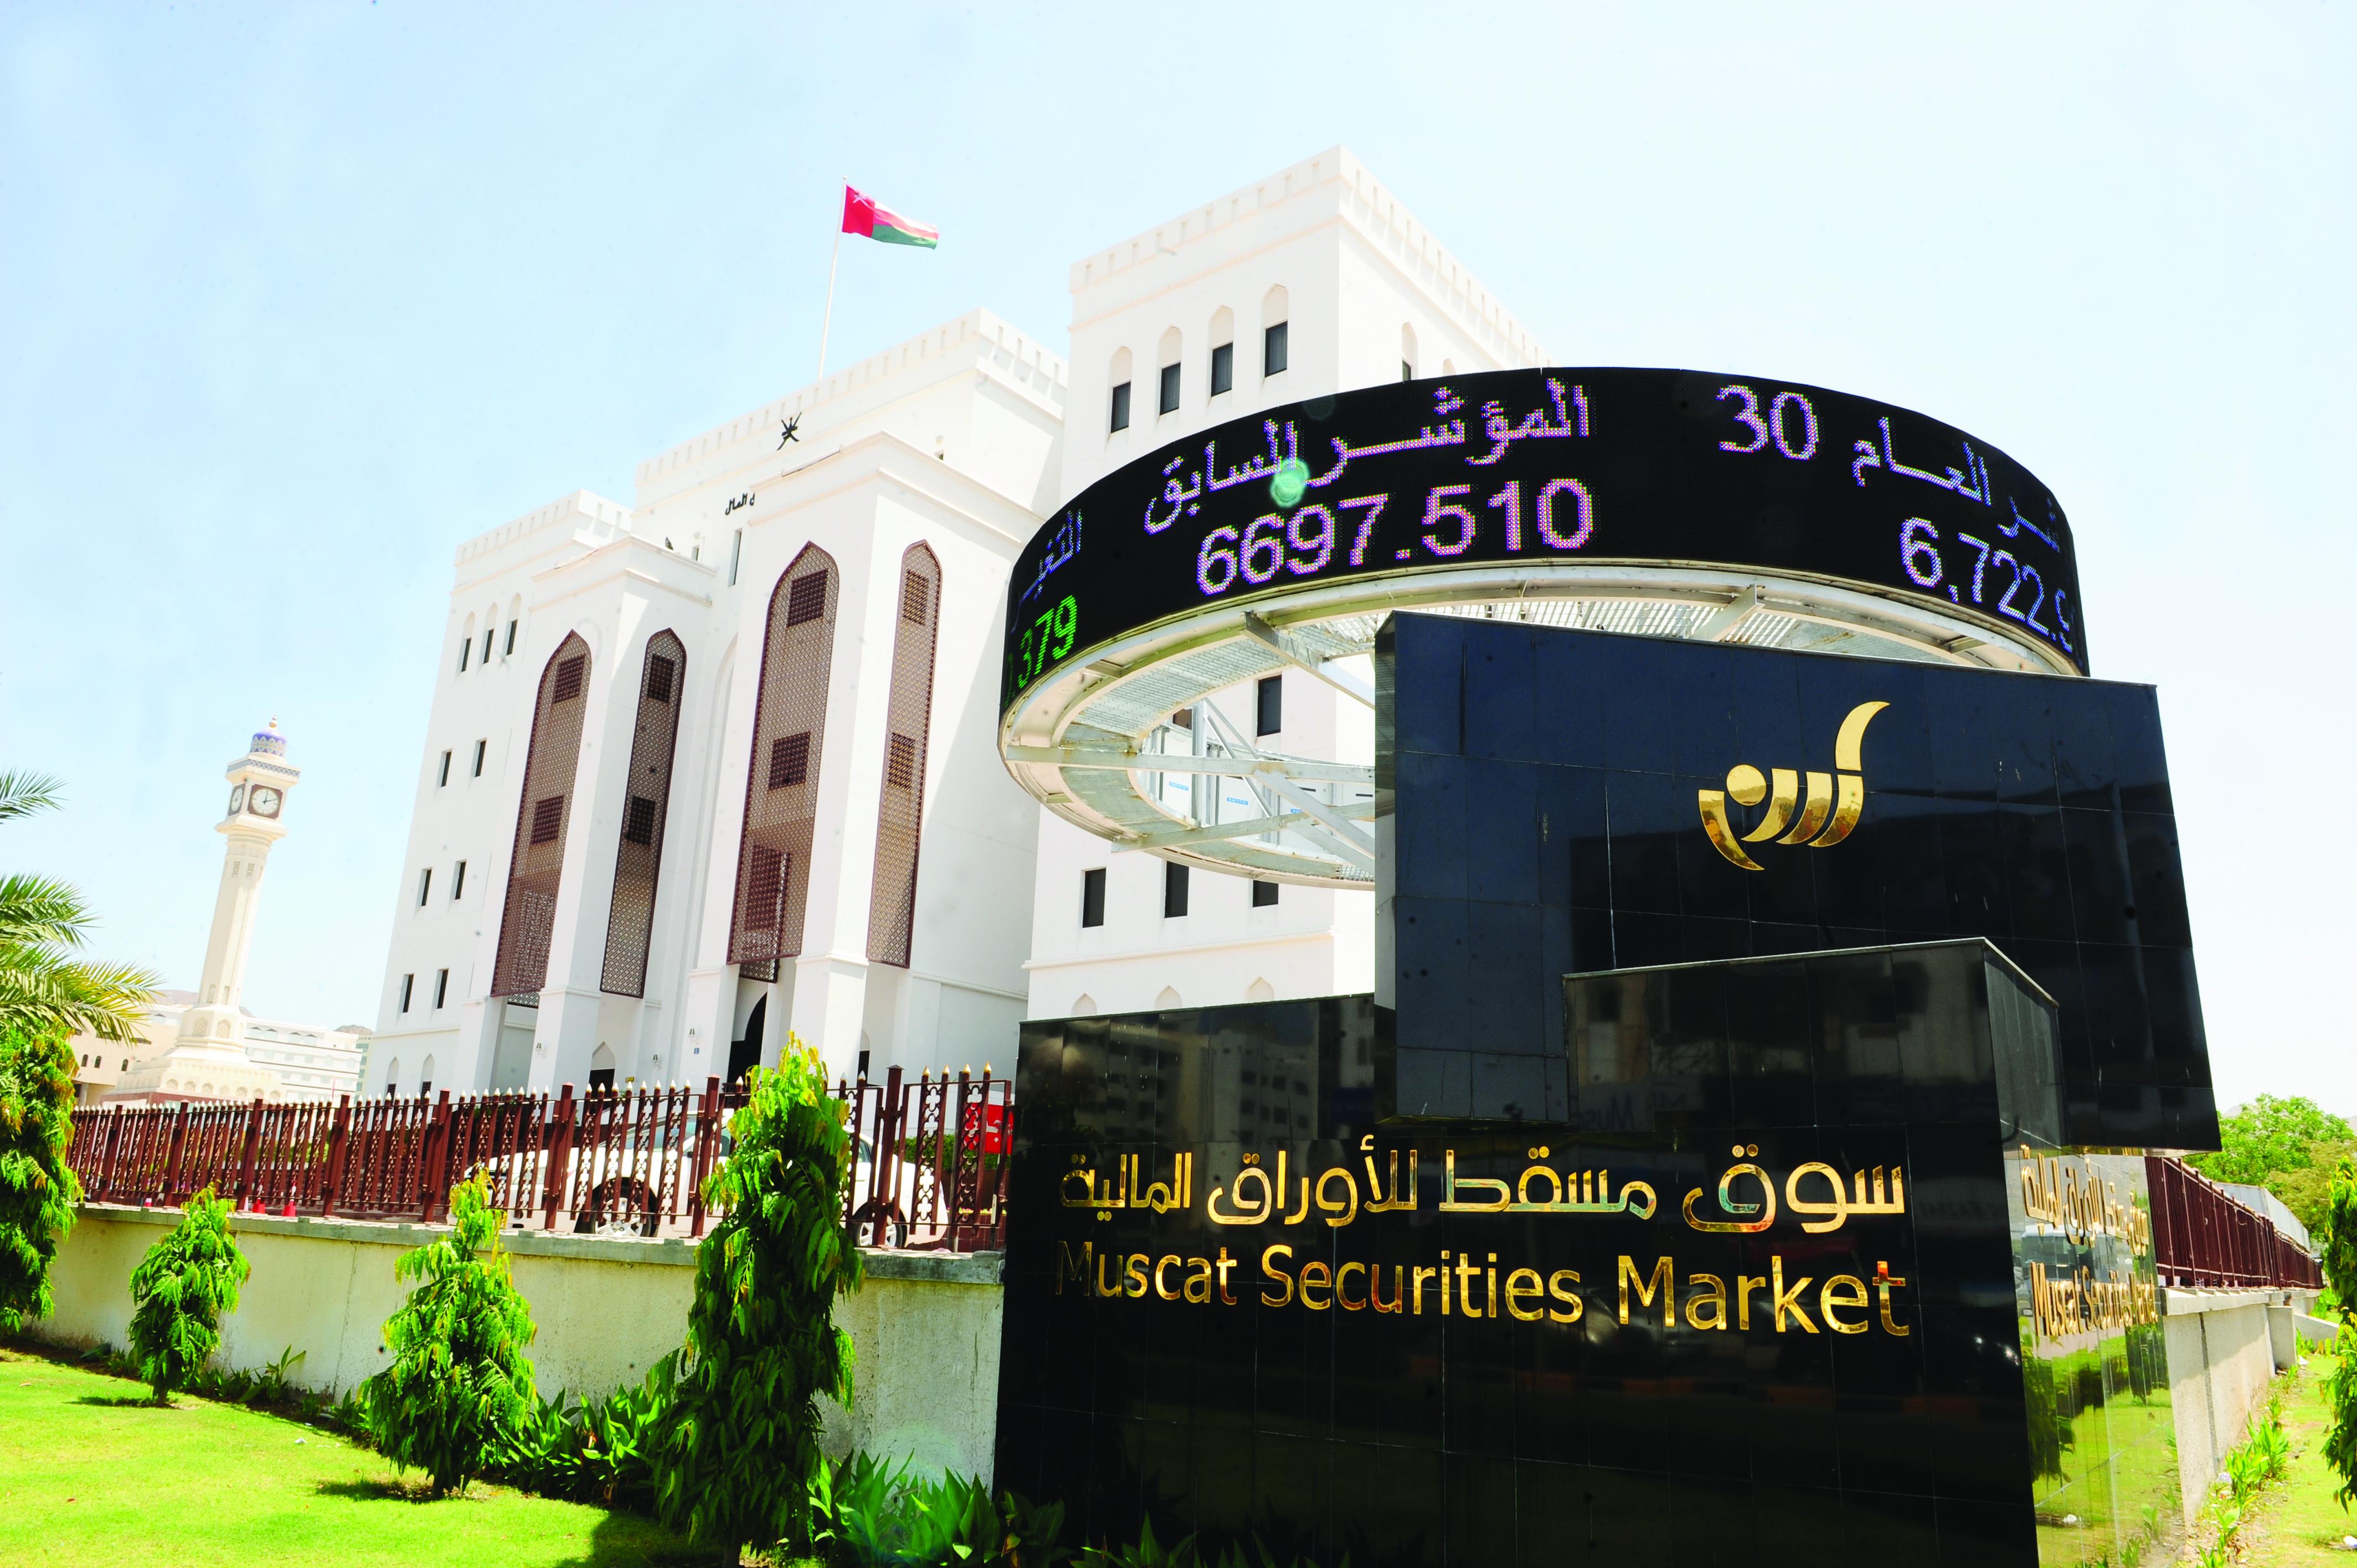 Golden group gets nod for OMR200m sukuk issue